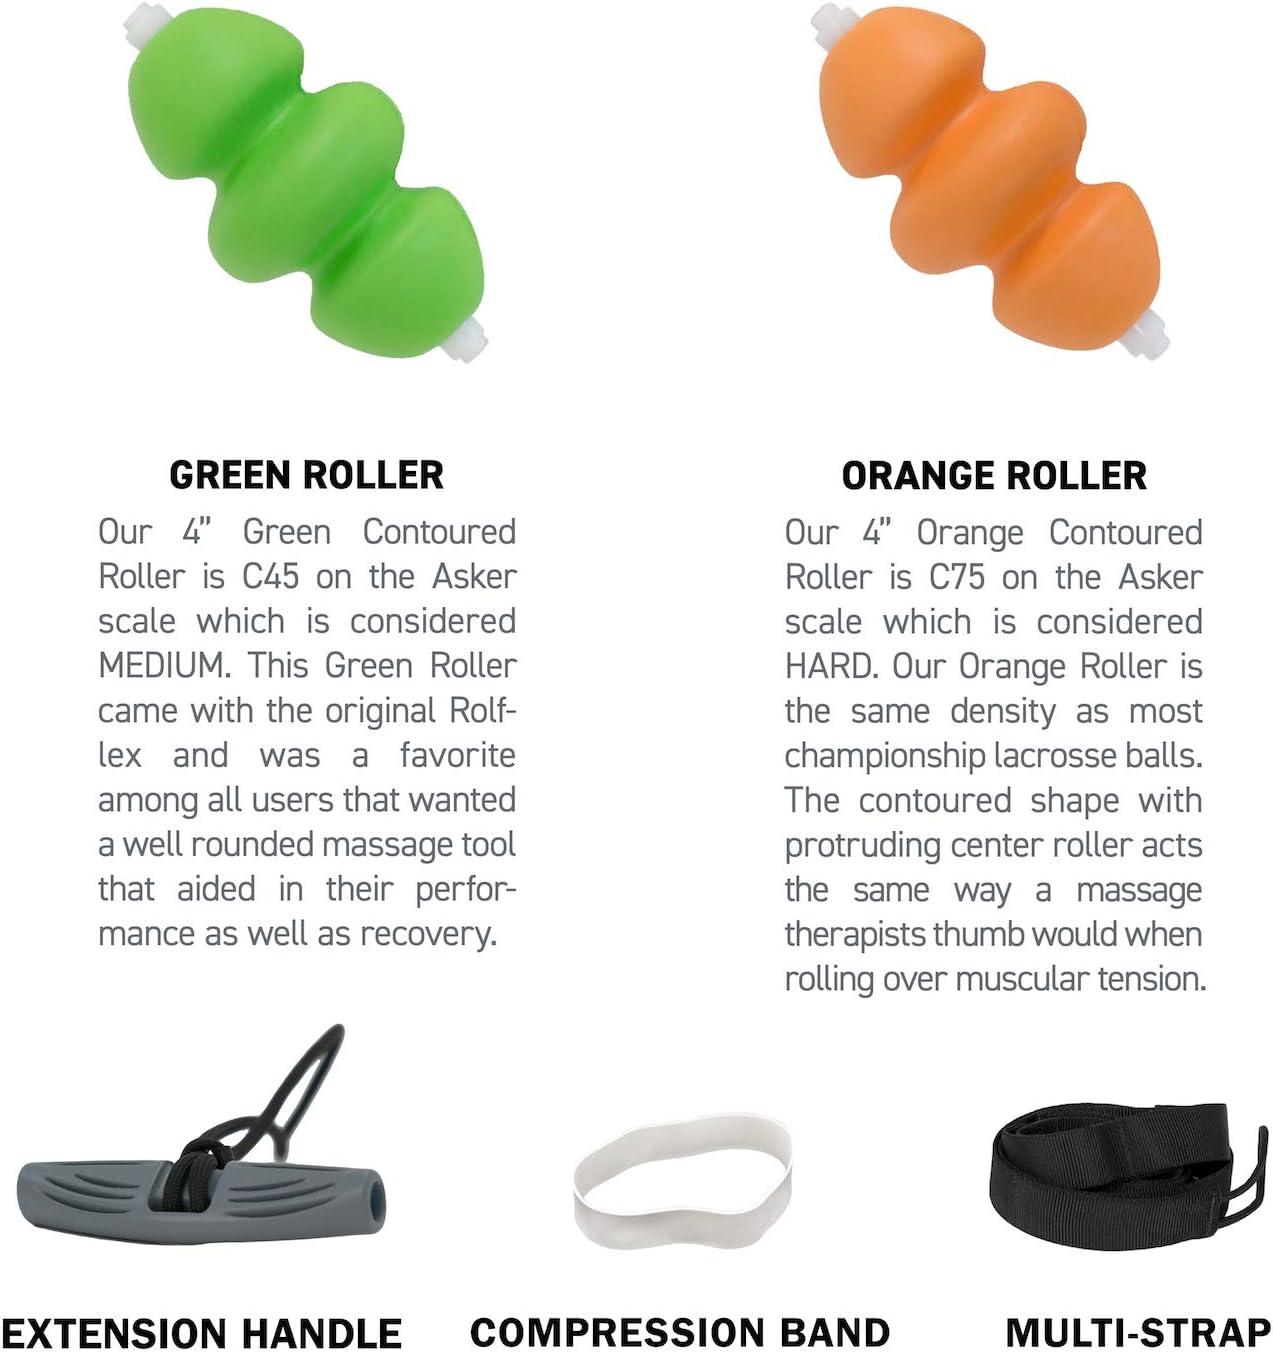 Orange Foam Roller Lacrosse Ball Density but Contoured for Deeper Muscle /& Fascial Massage EVA Rolflex Extreme Leverage Foam Rolling Combo System